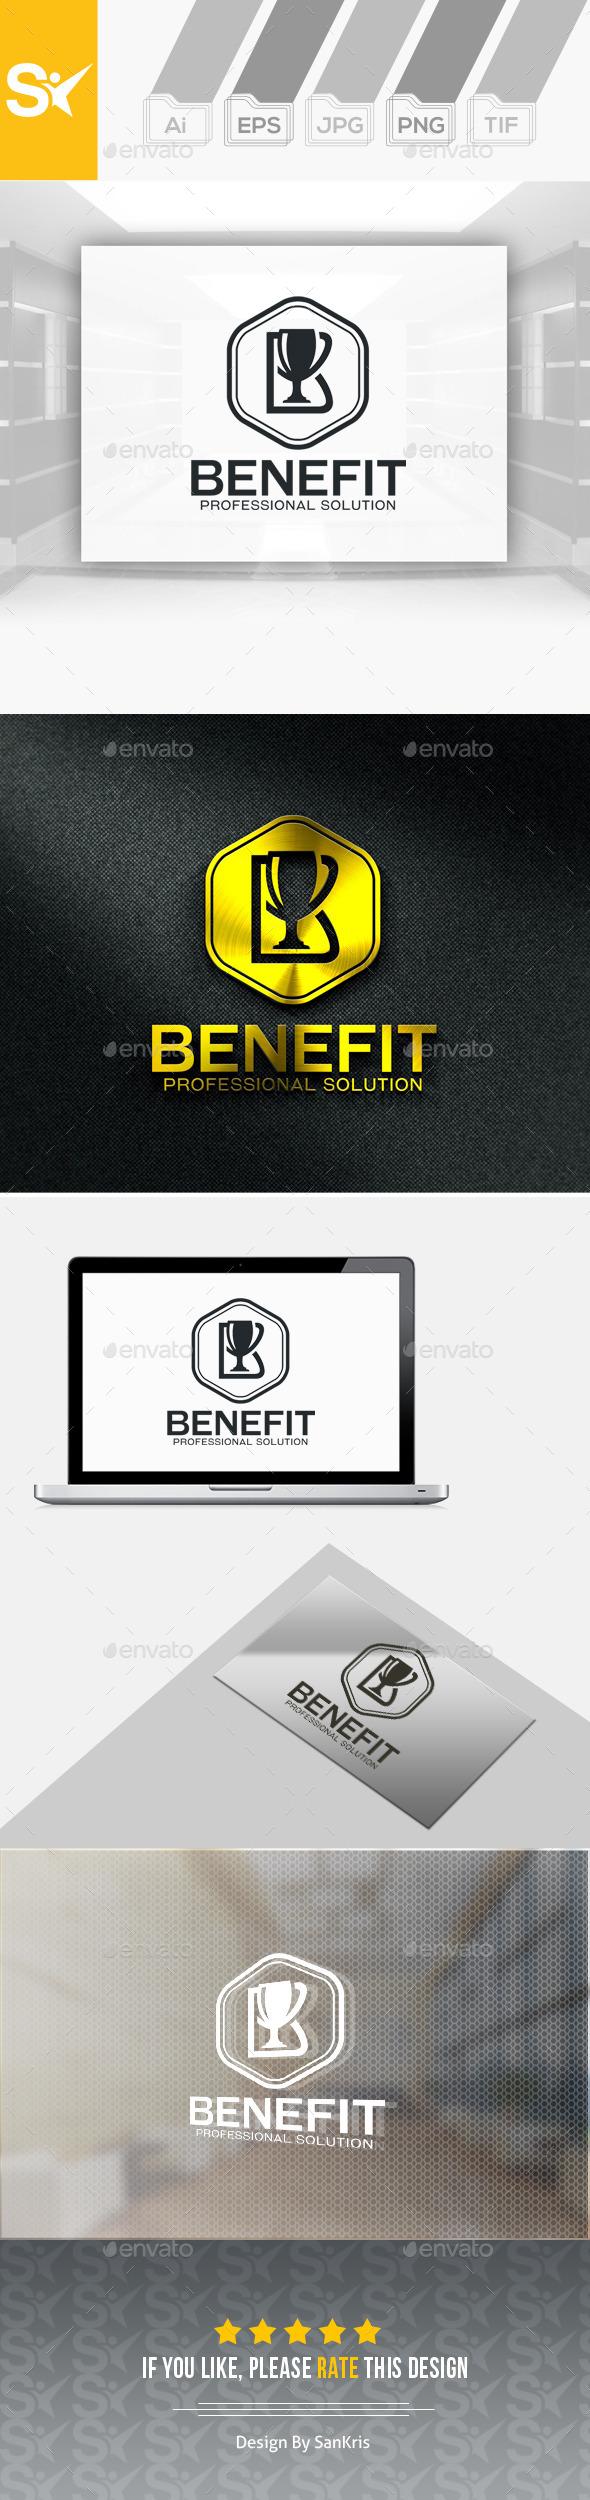 Benefit Pro Logo B letter